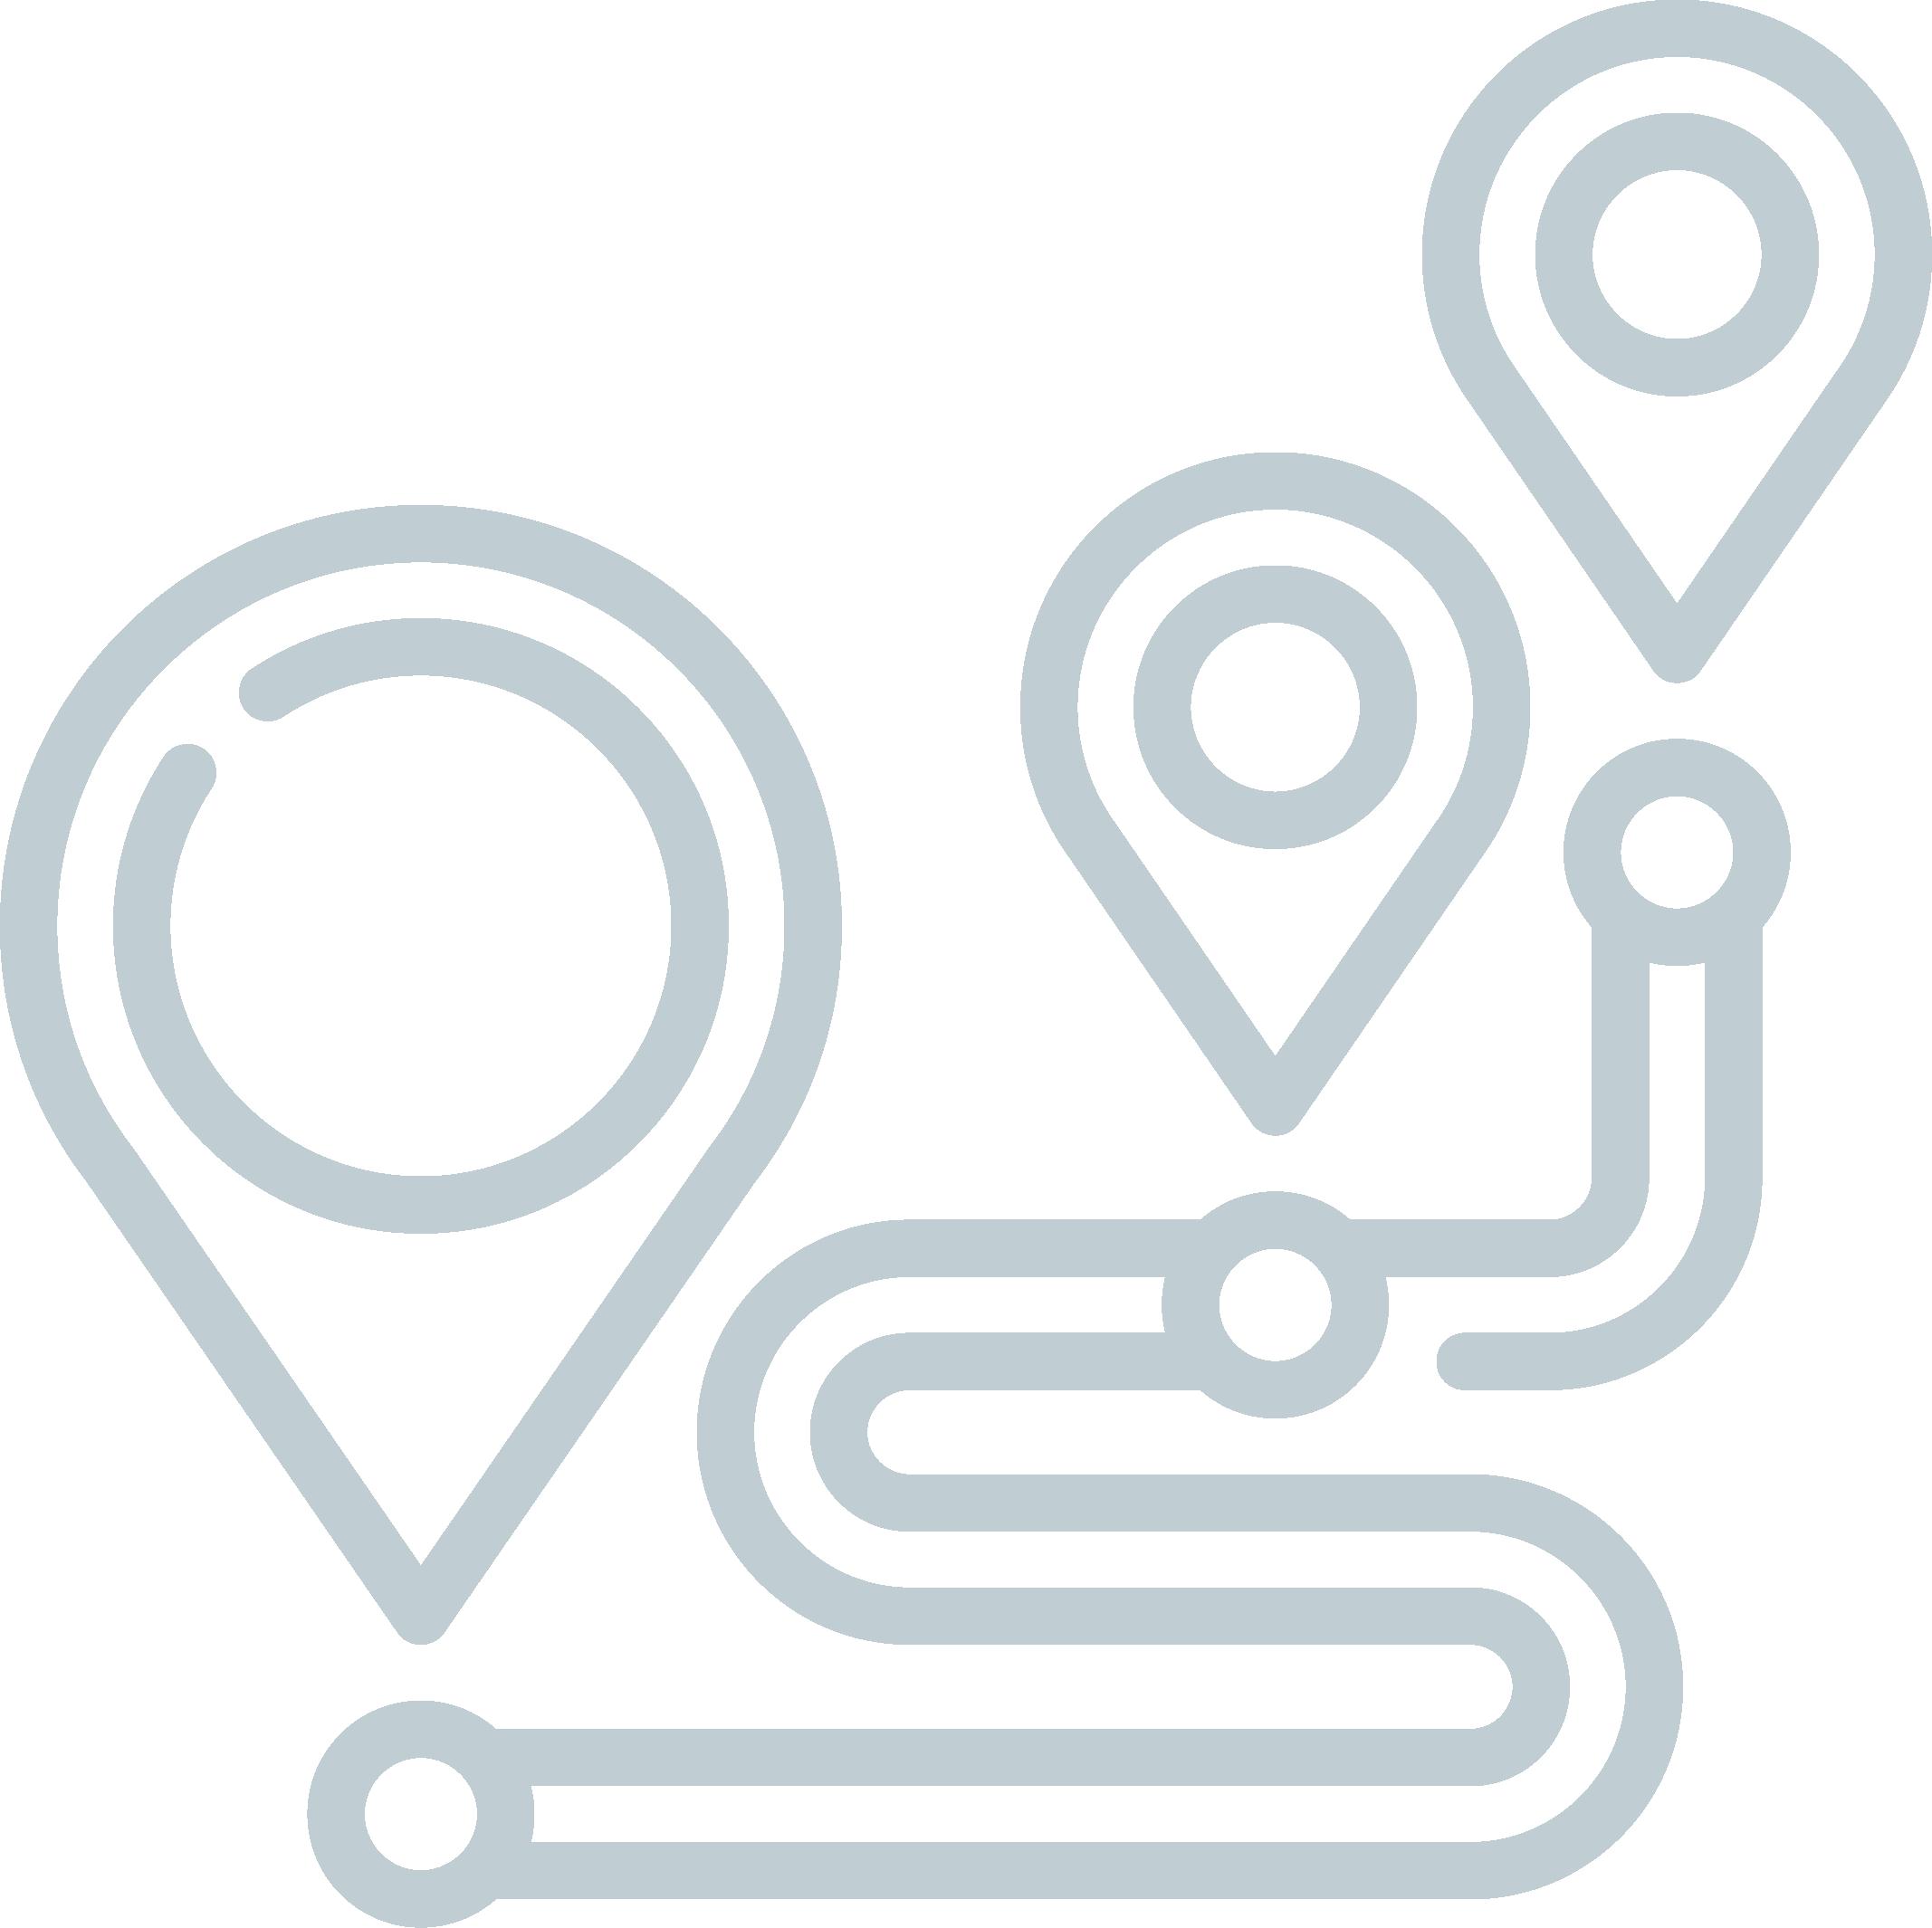 Organización de rutas de entrega